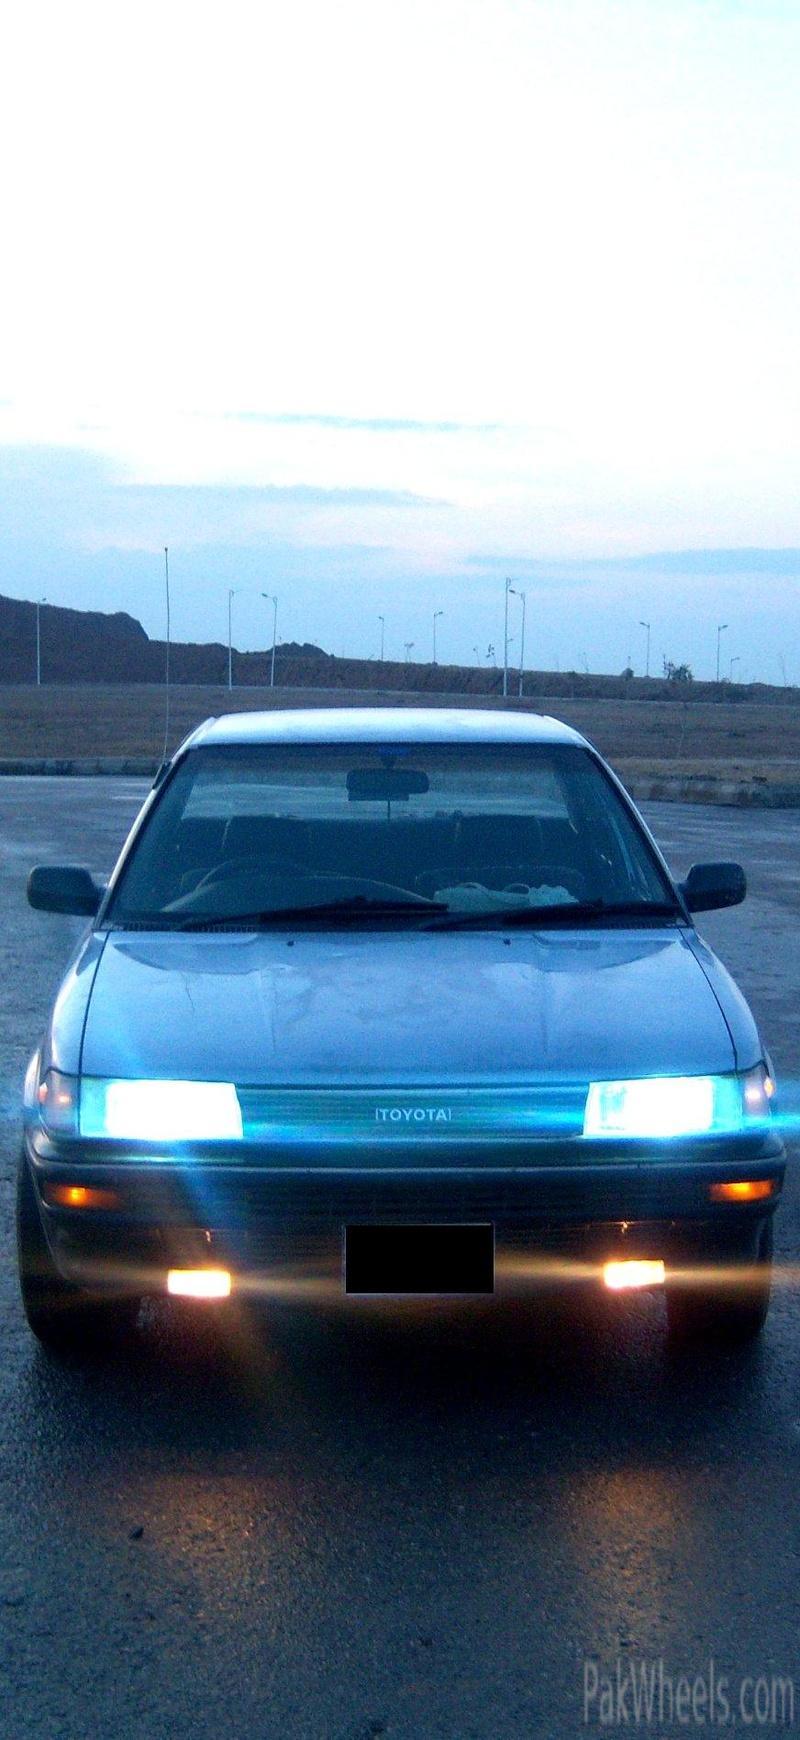 88 to 90 Toyota Corolla Fanclub - 312711